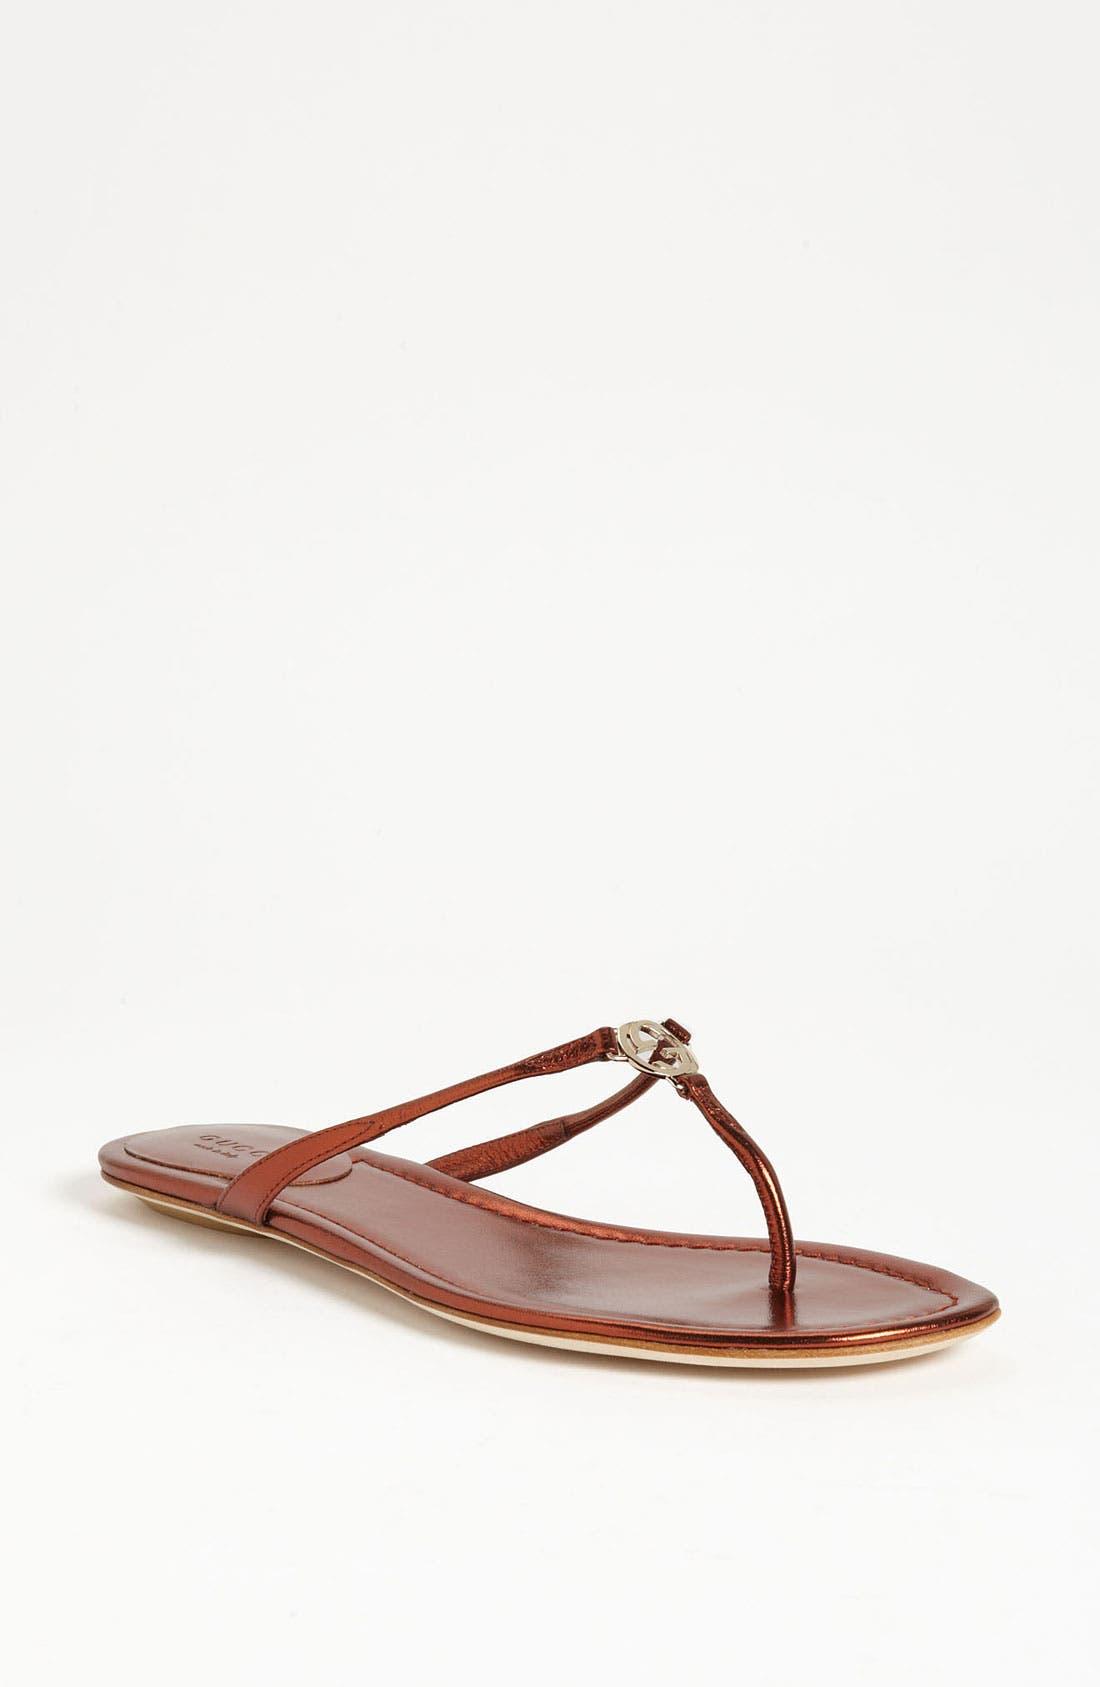 Alternate Image 1 Selected - Gucci 'Elaine' Thong Sandal